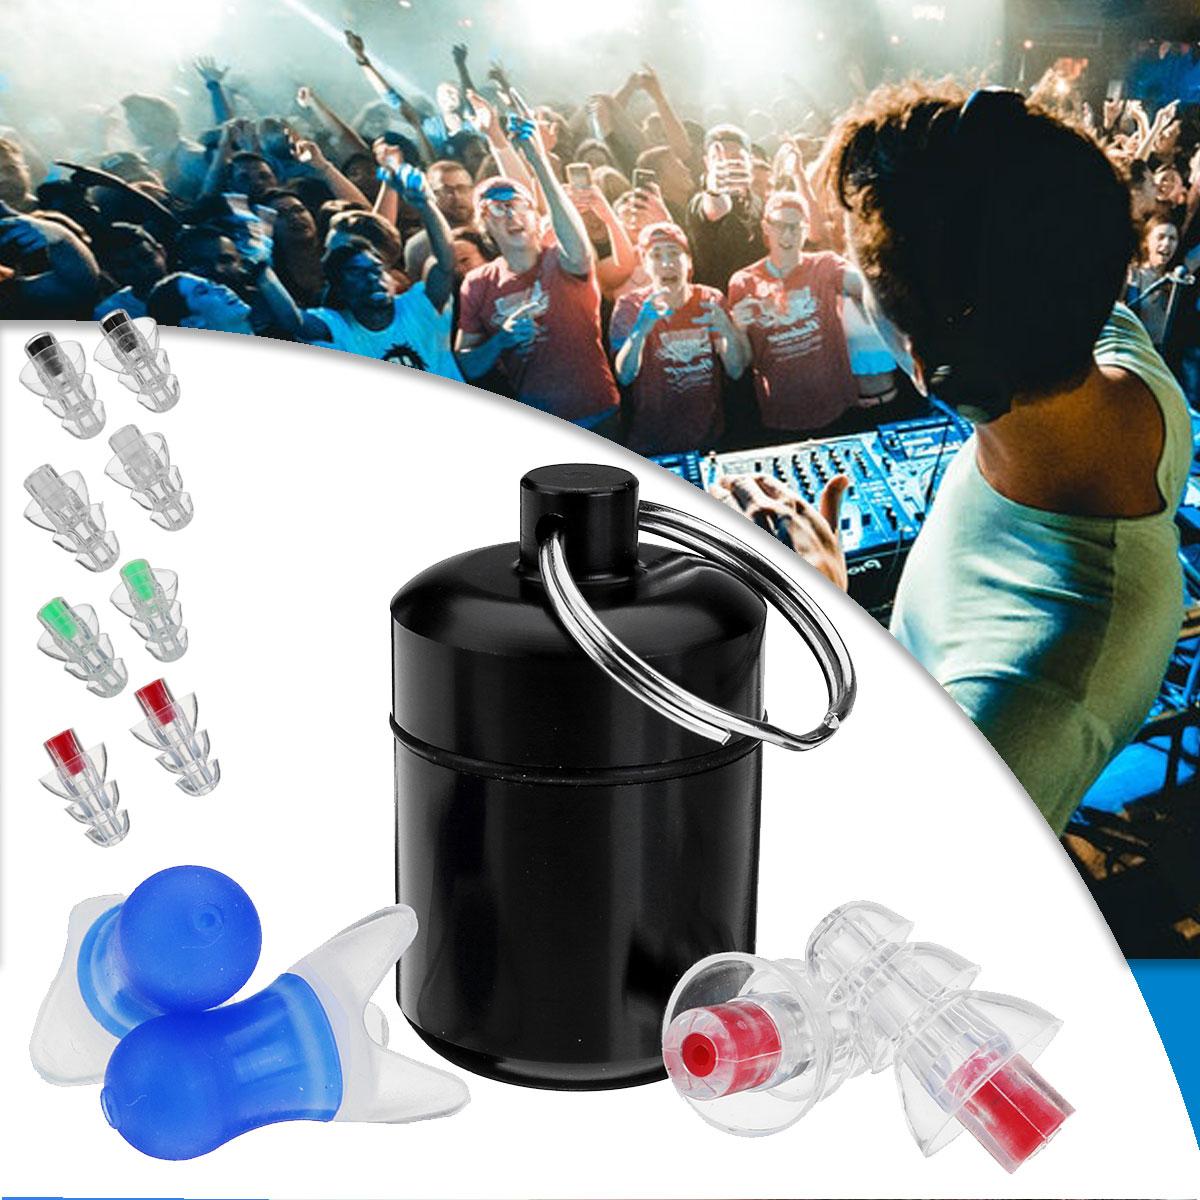 Safurance 2Pcs Noise Cancelling Earplugs Hearing Protection Reusable Silicone Ear Plugs For Sleep Bar whit Bottle свитшот print bar sleep autumn